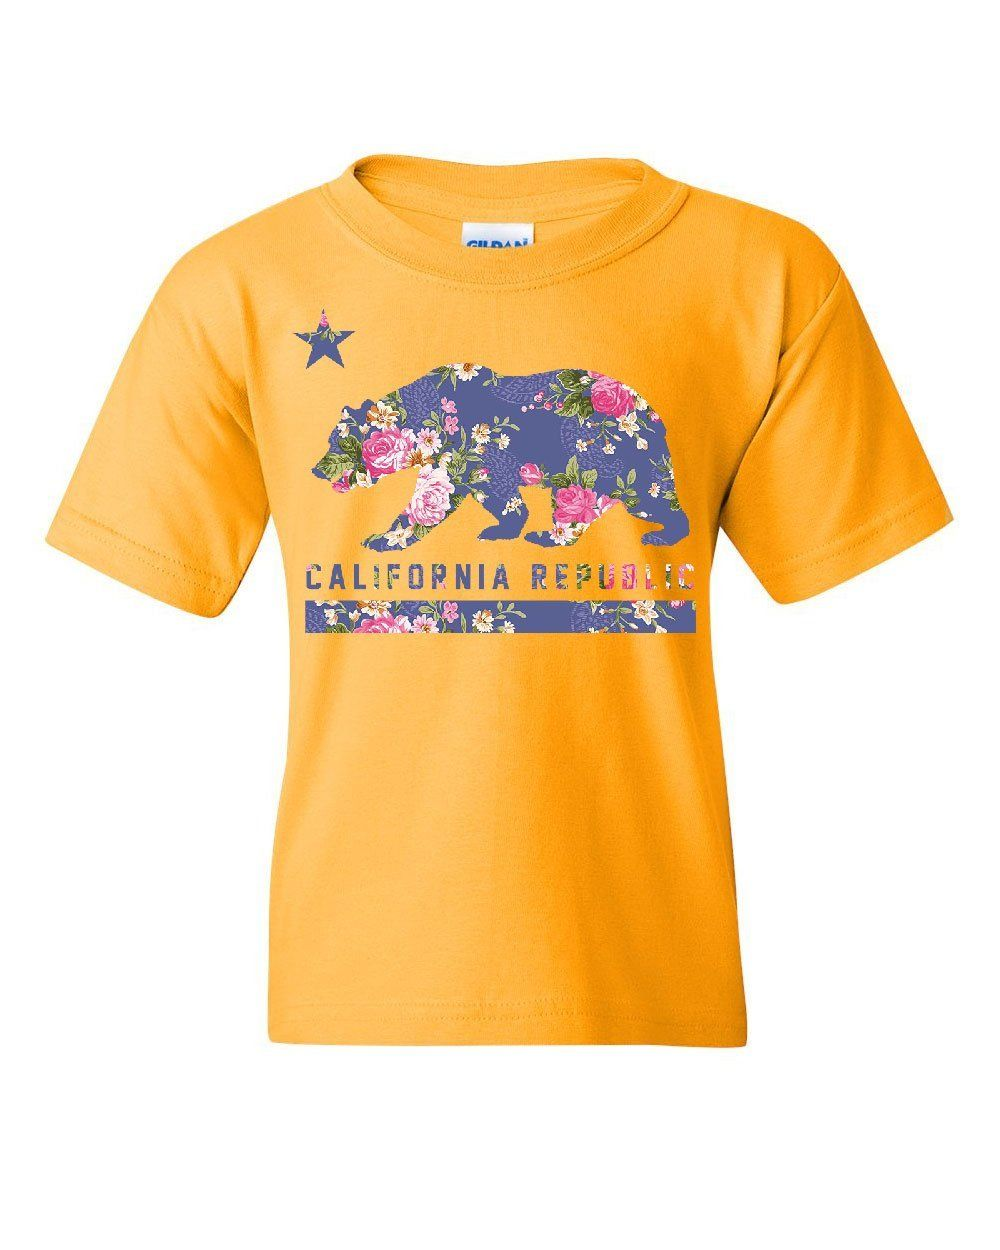 California Republic Floral Youth T-Shirt Star Bear Cali CA West Coast Kids Tee